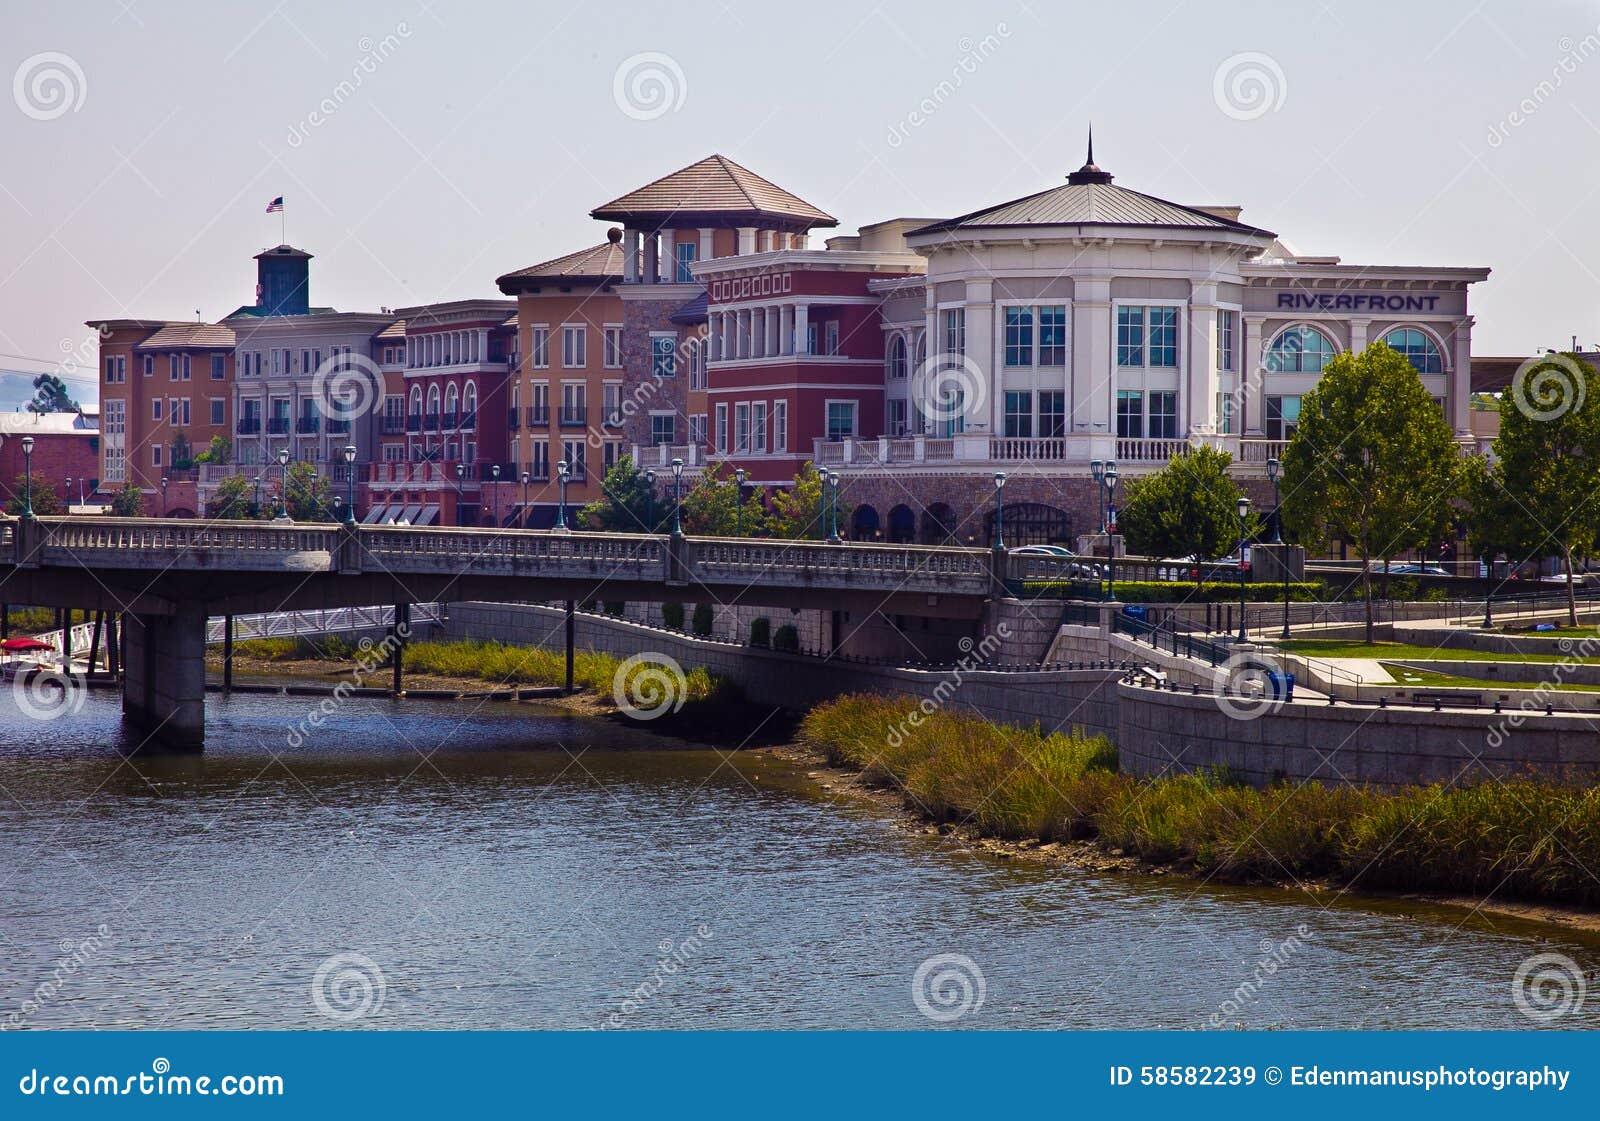 Downtown Napa Riverfront Buildings